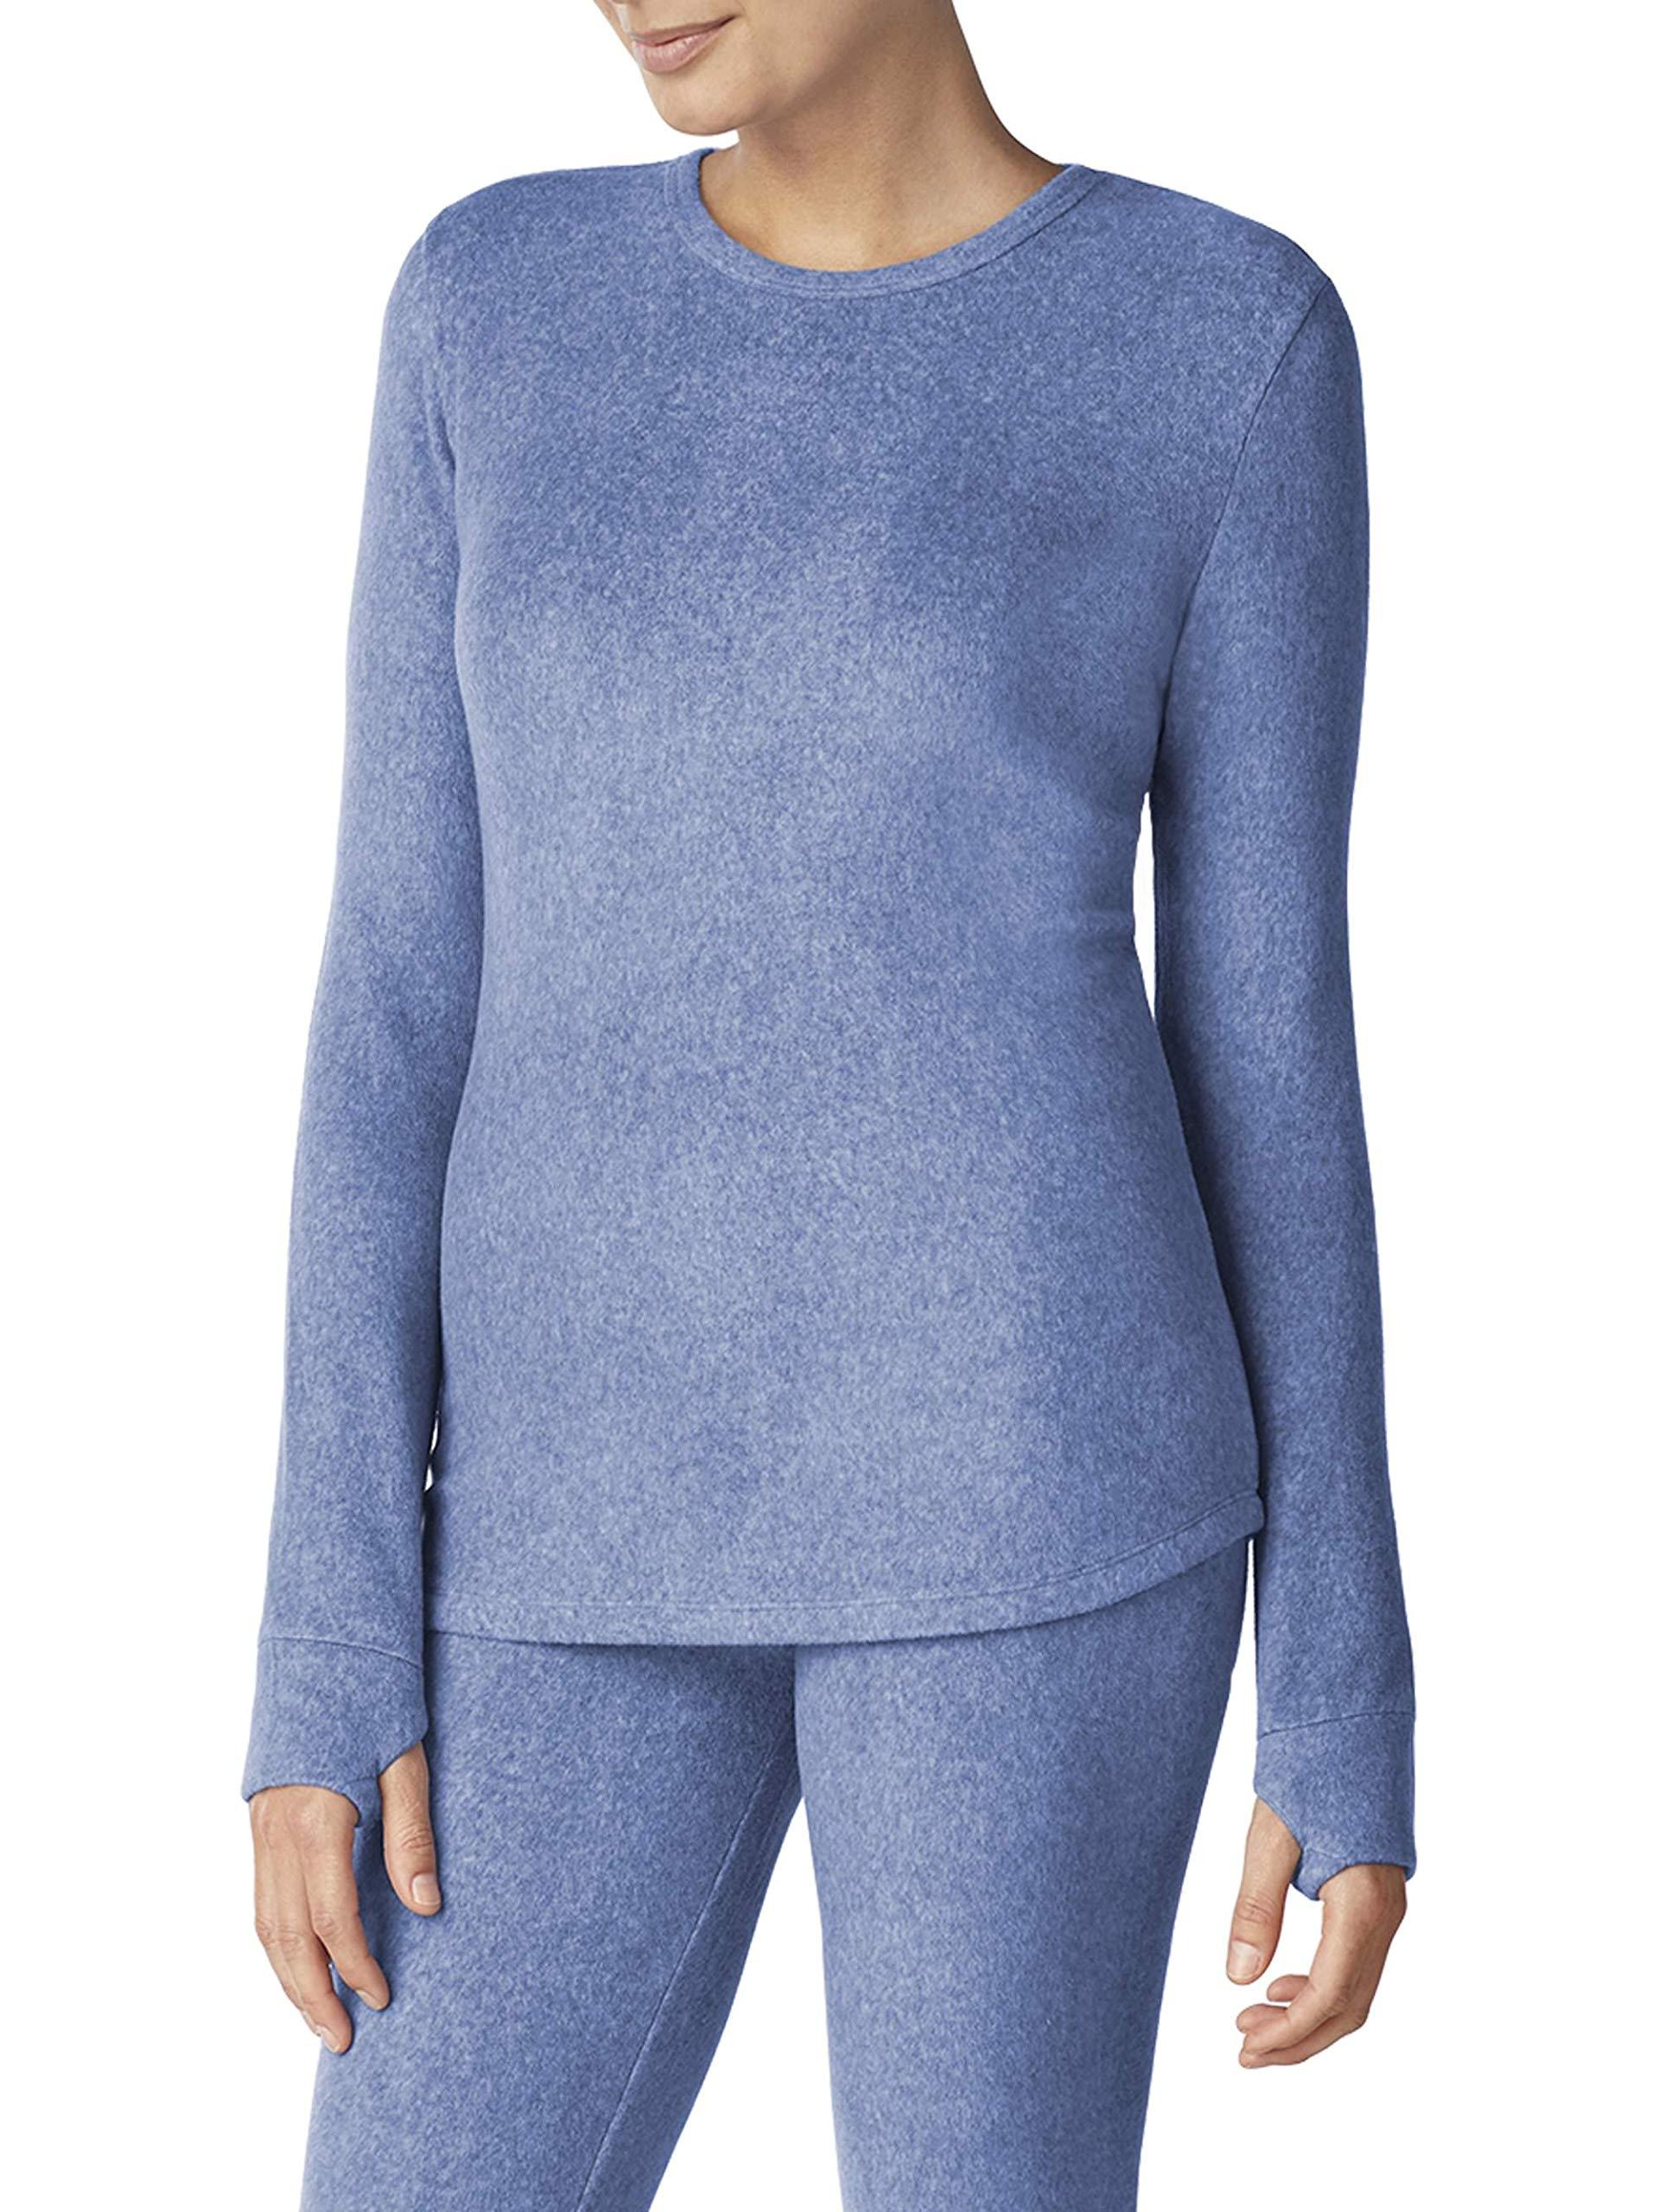 Cuddl Duds ClimateRight Women's Stretch Fleece Warm Underwear Long Sleeve Top (M - Cloud Blue) by Cuddl Duds